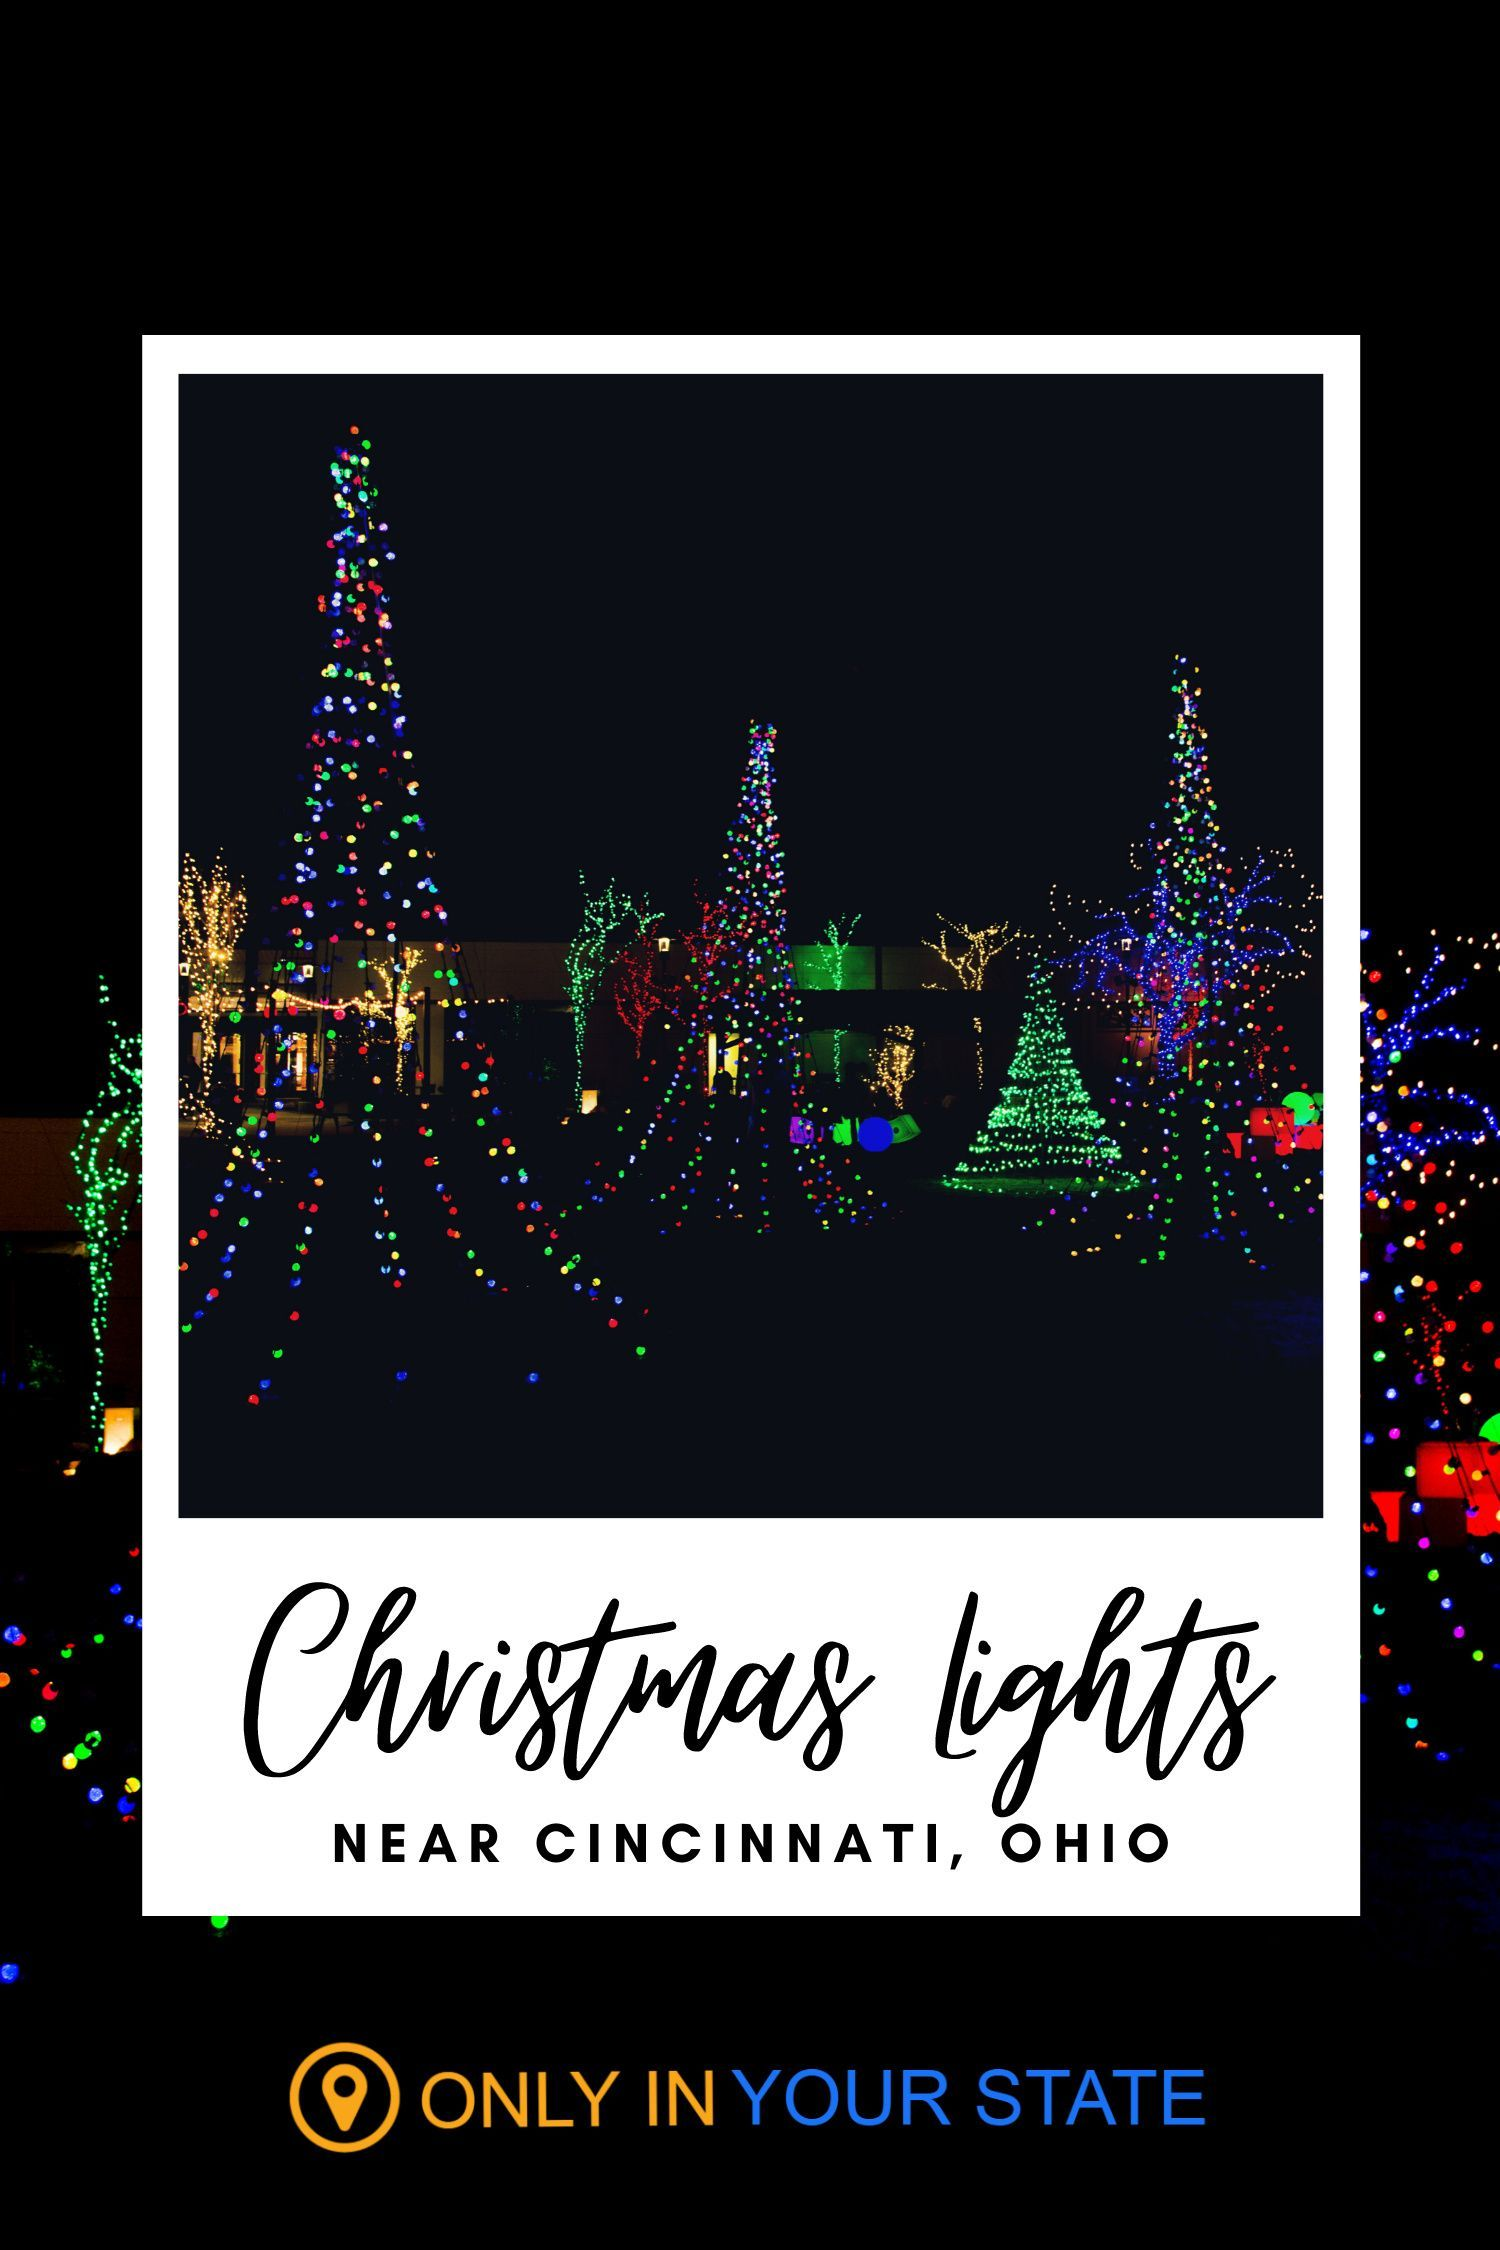 Christmas Things To Do In Cincinnati : christmas, things, cincinnati, Drive-Thru, Christmas, Lights, Displays, Cincinnati, Whole, Family, Enjoy, Lights,, Light, Displays,